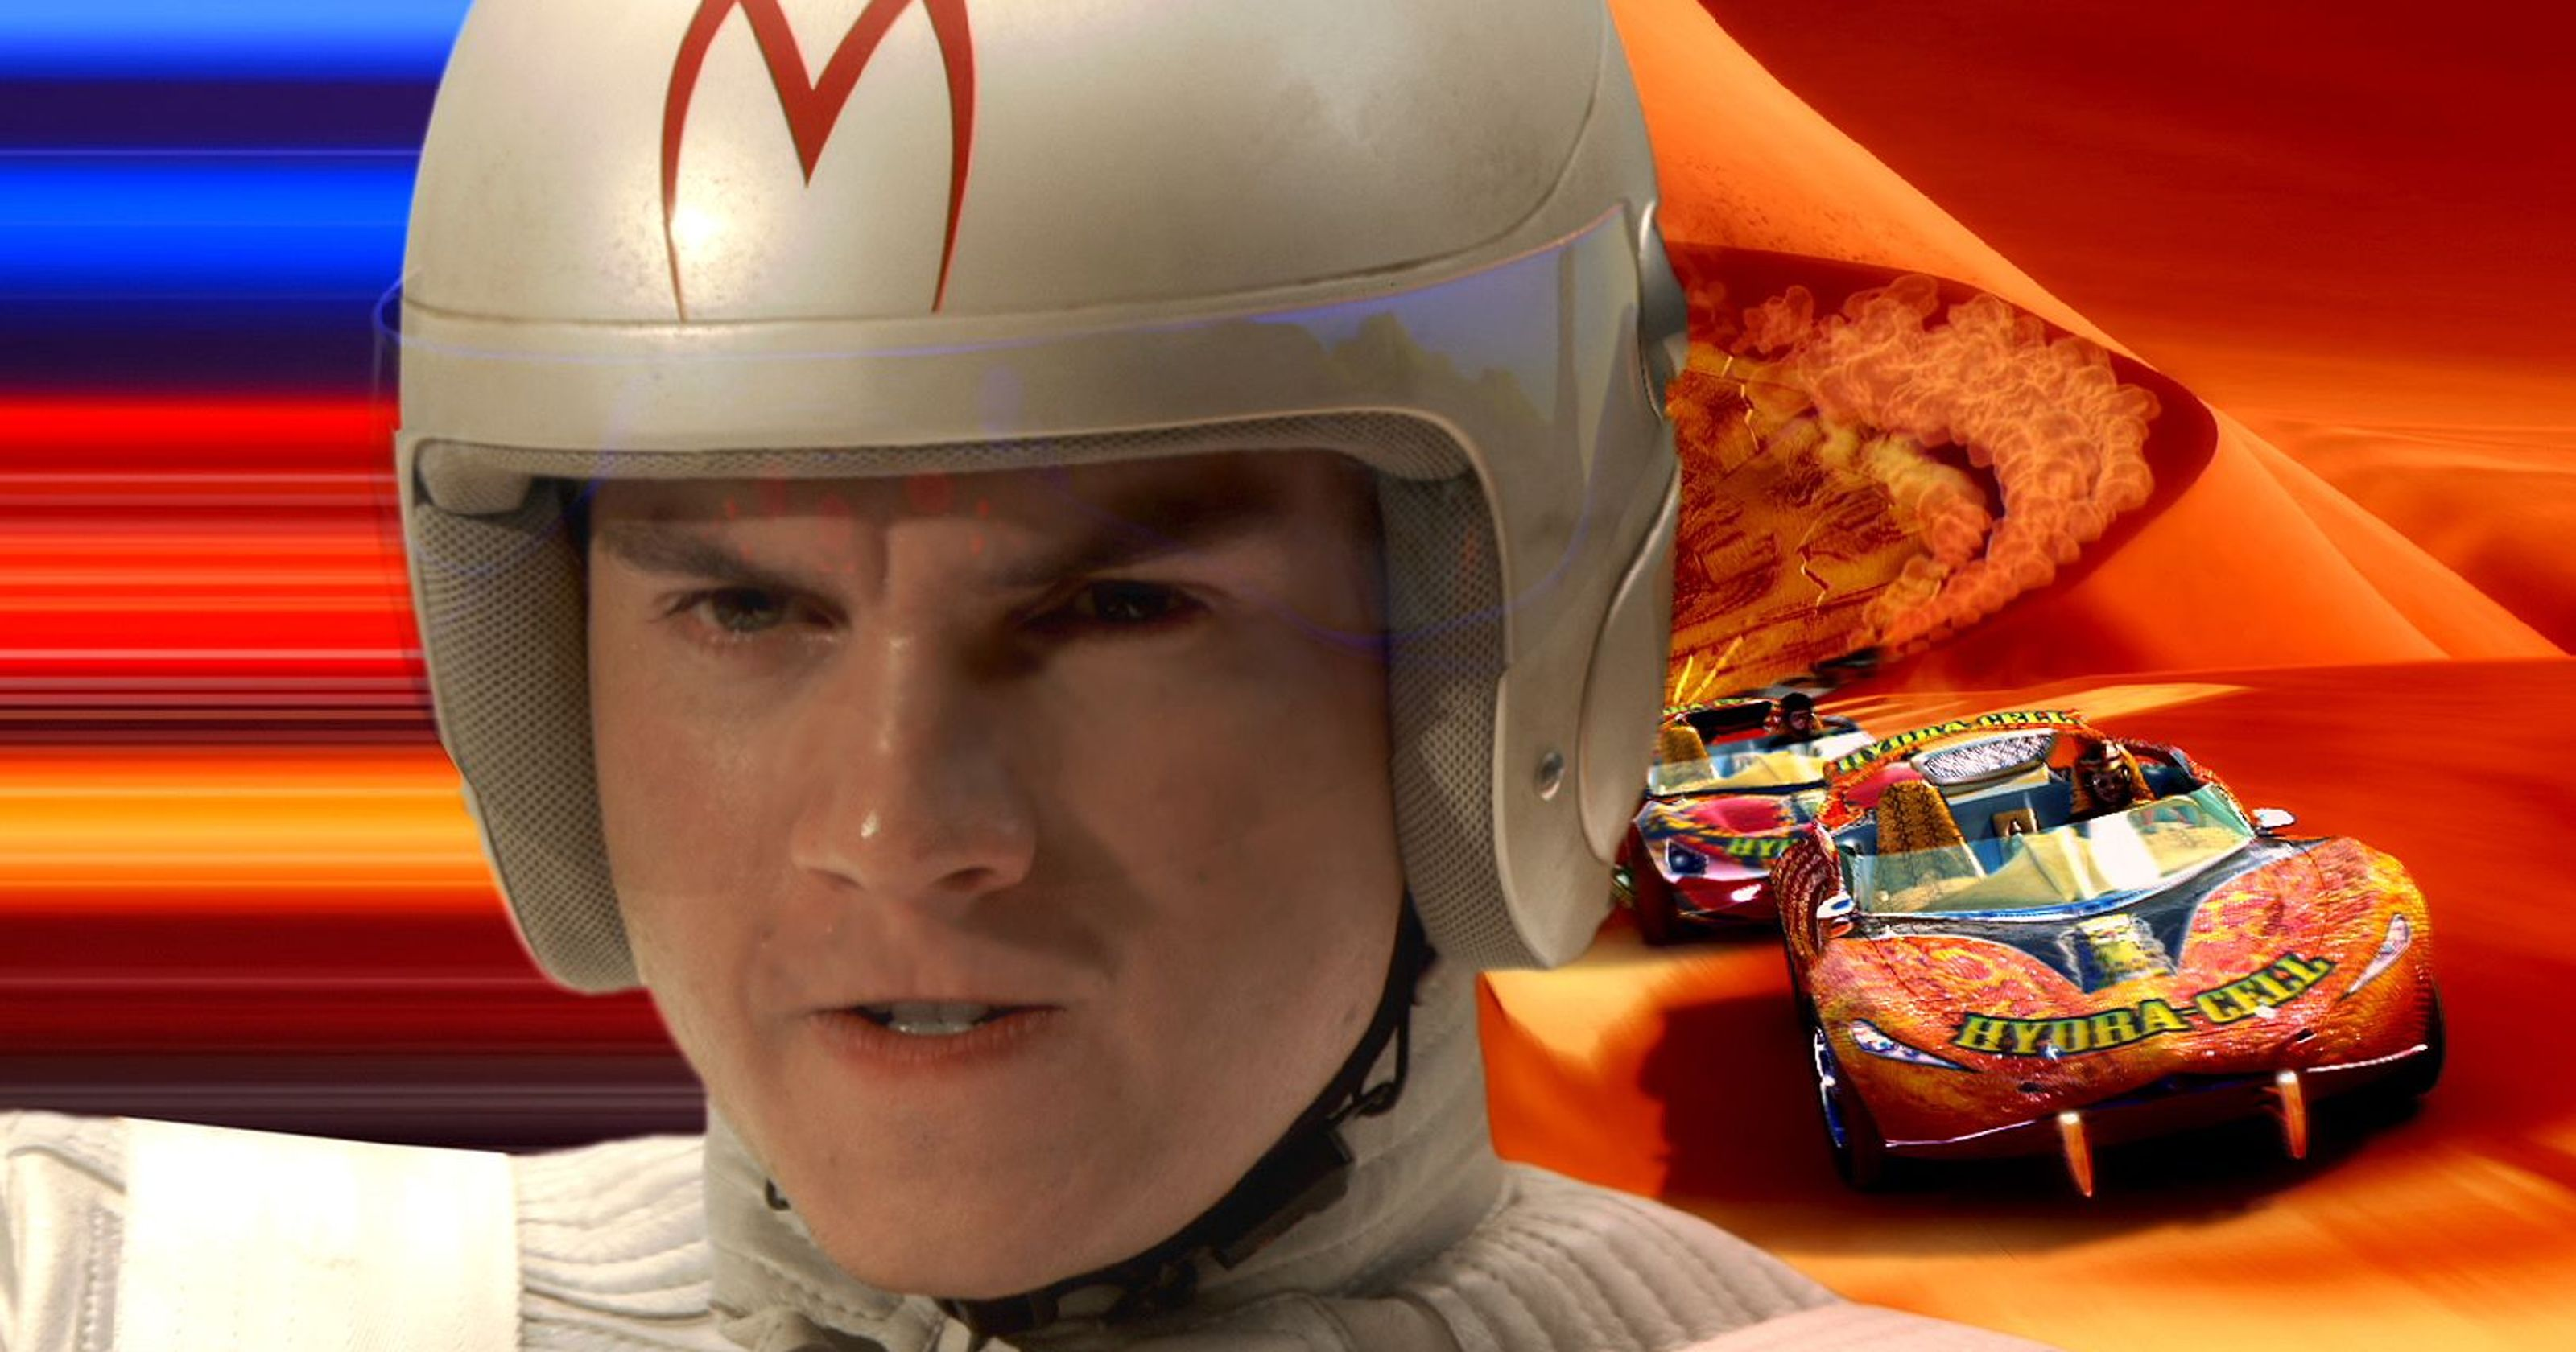 Emile Hirsch as Speed Racer (2008)